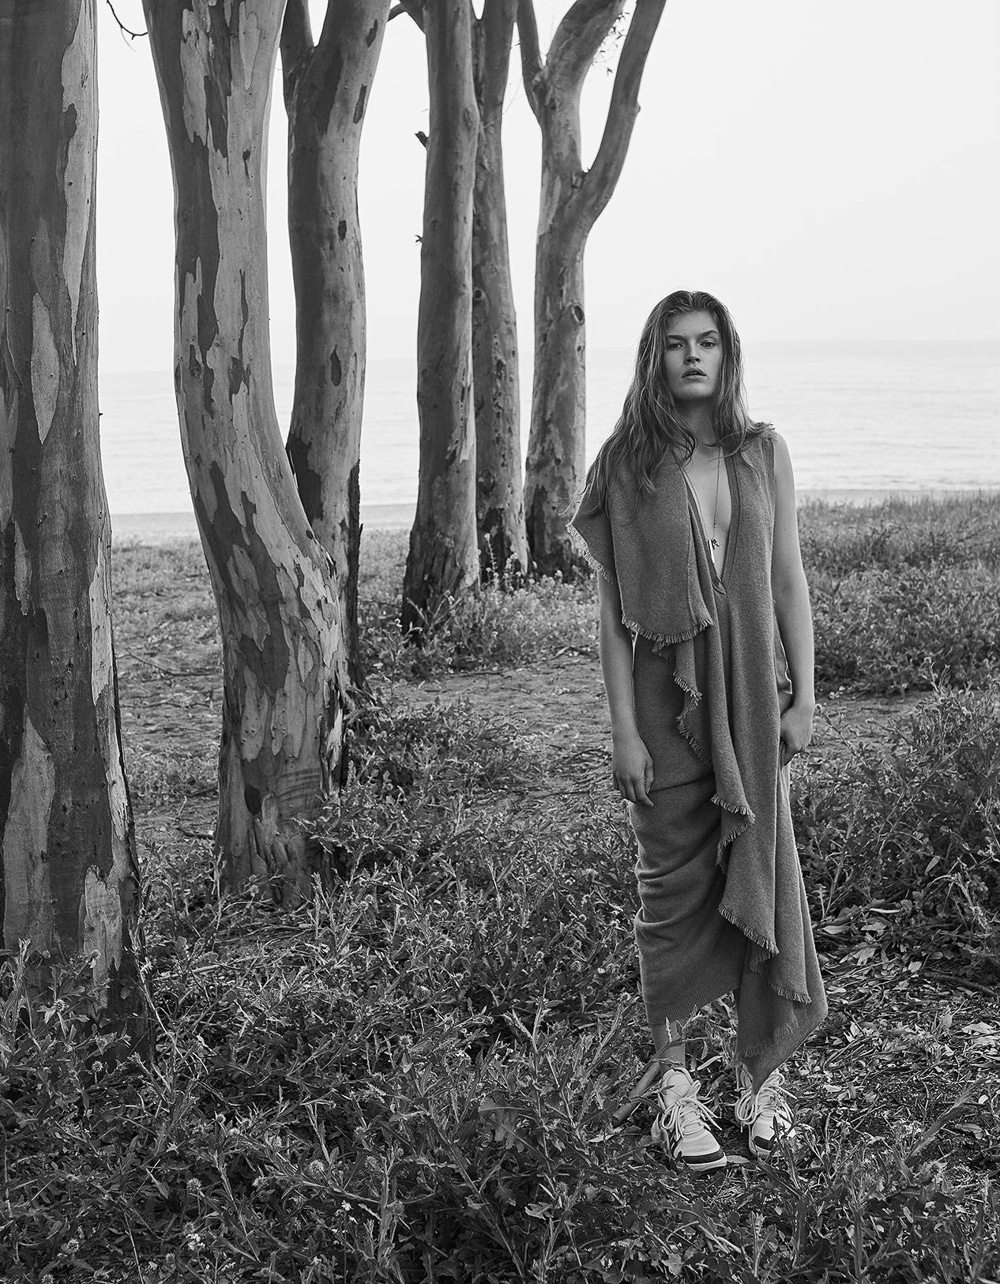 Vogue-Poland-Molly-Smith-Agata-Pospieszynska-16.jpg